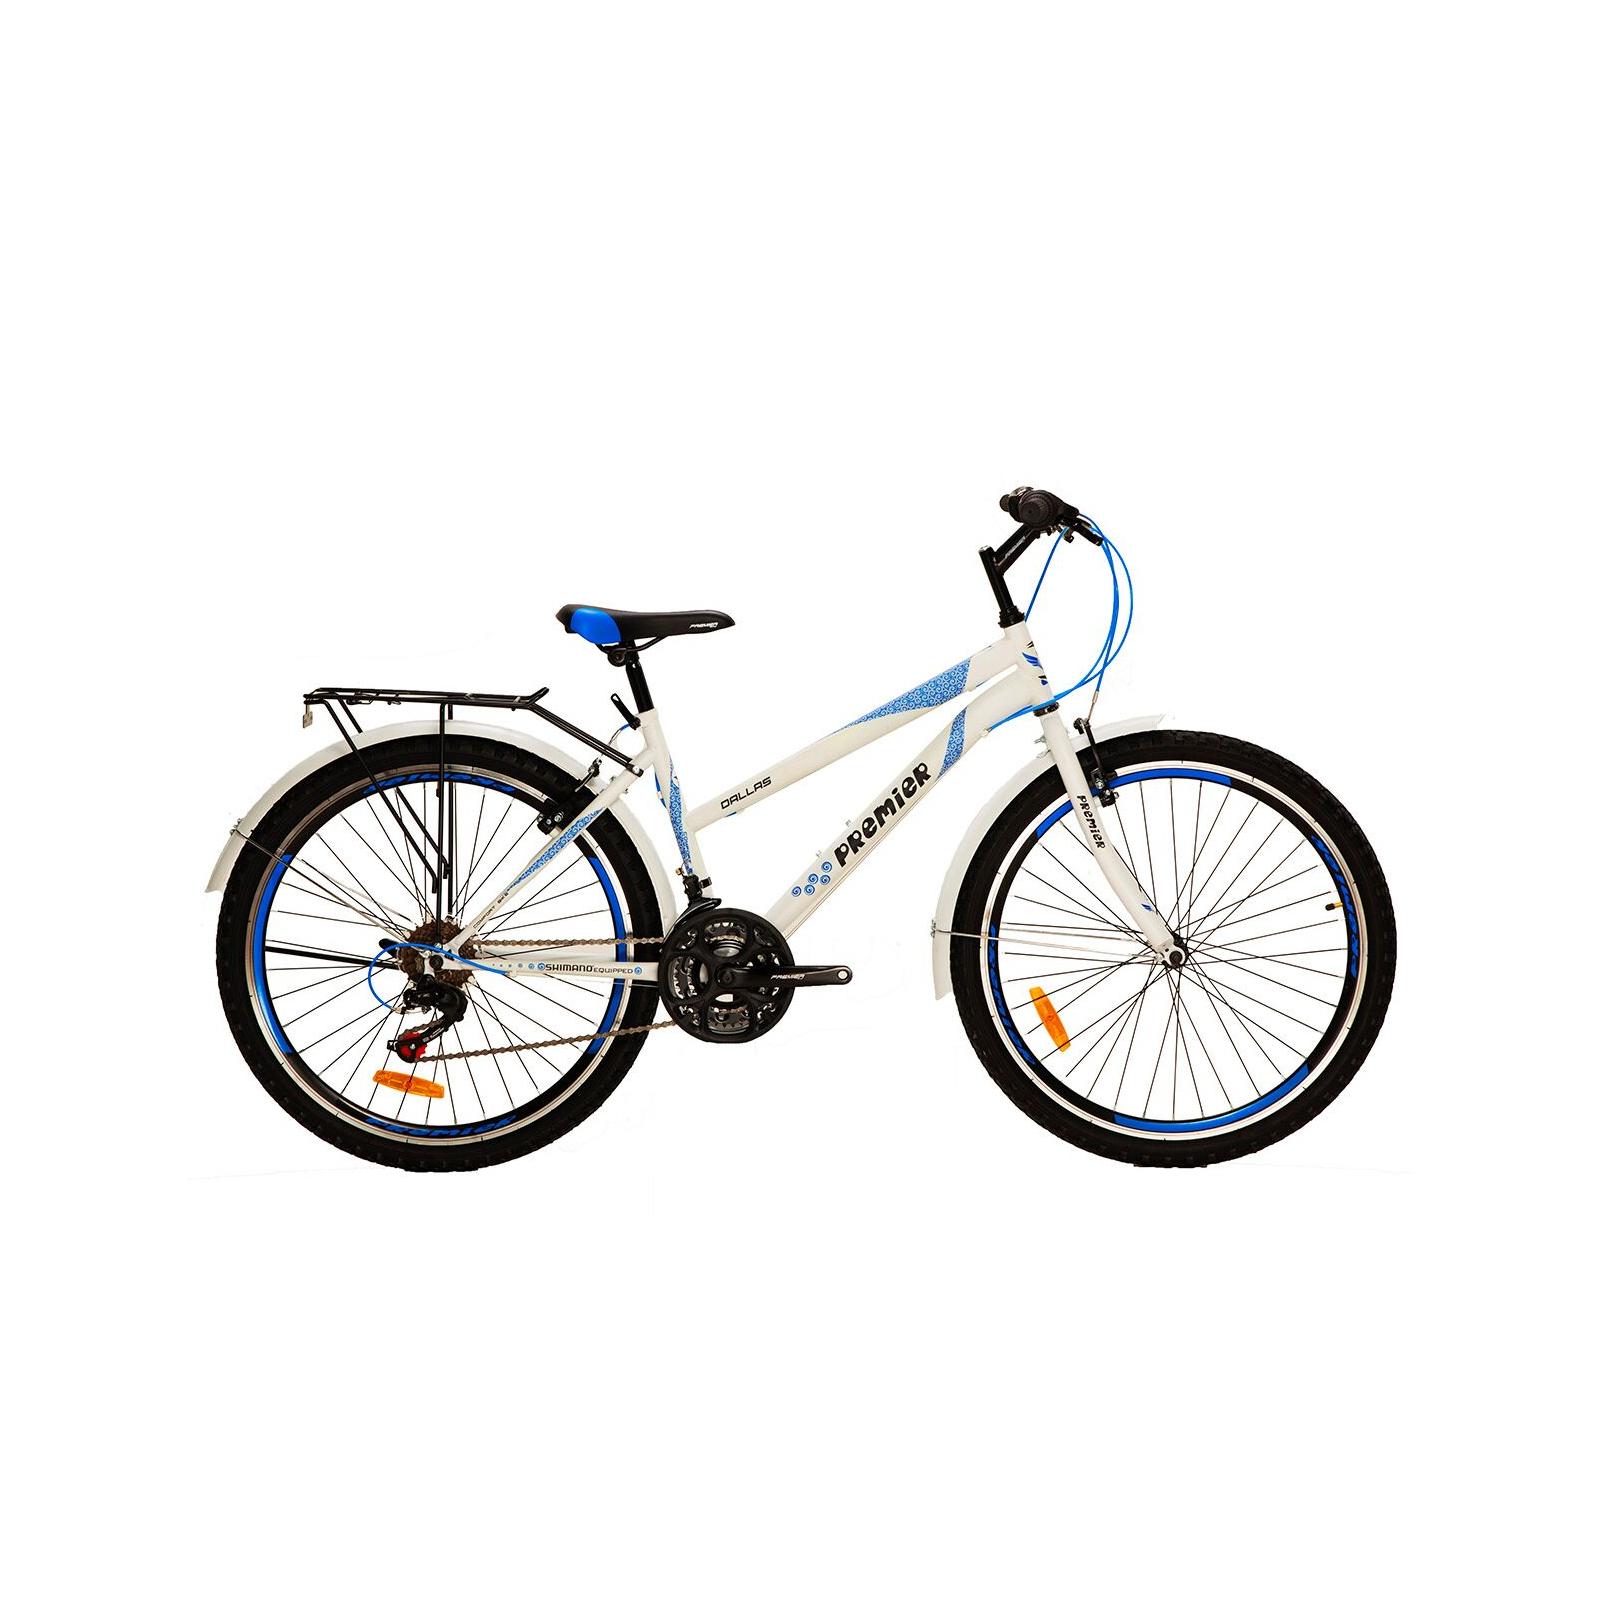 "Велосипед Premier Dallas 26 16"" matt white/neon blue (SP0001500)"